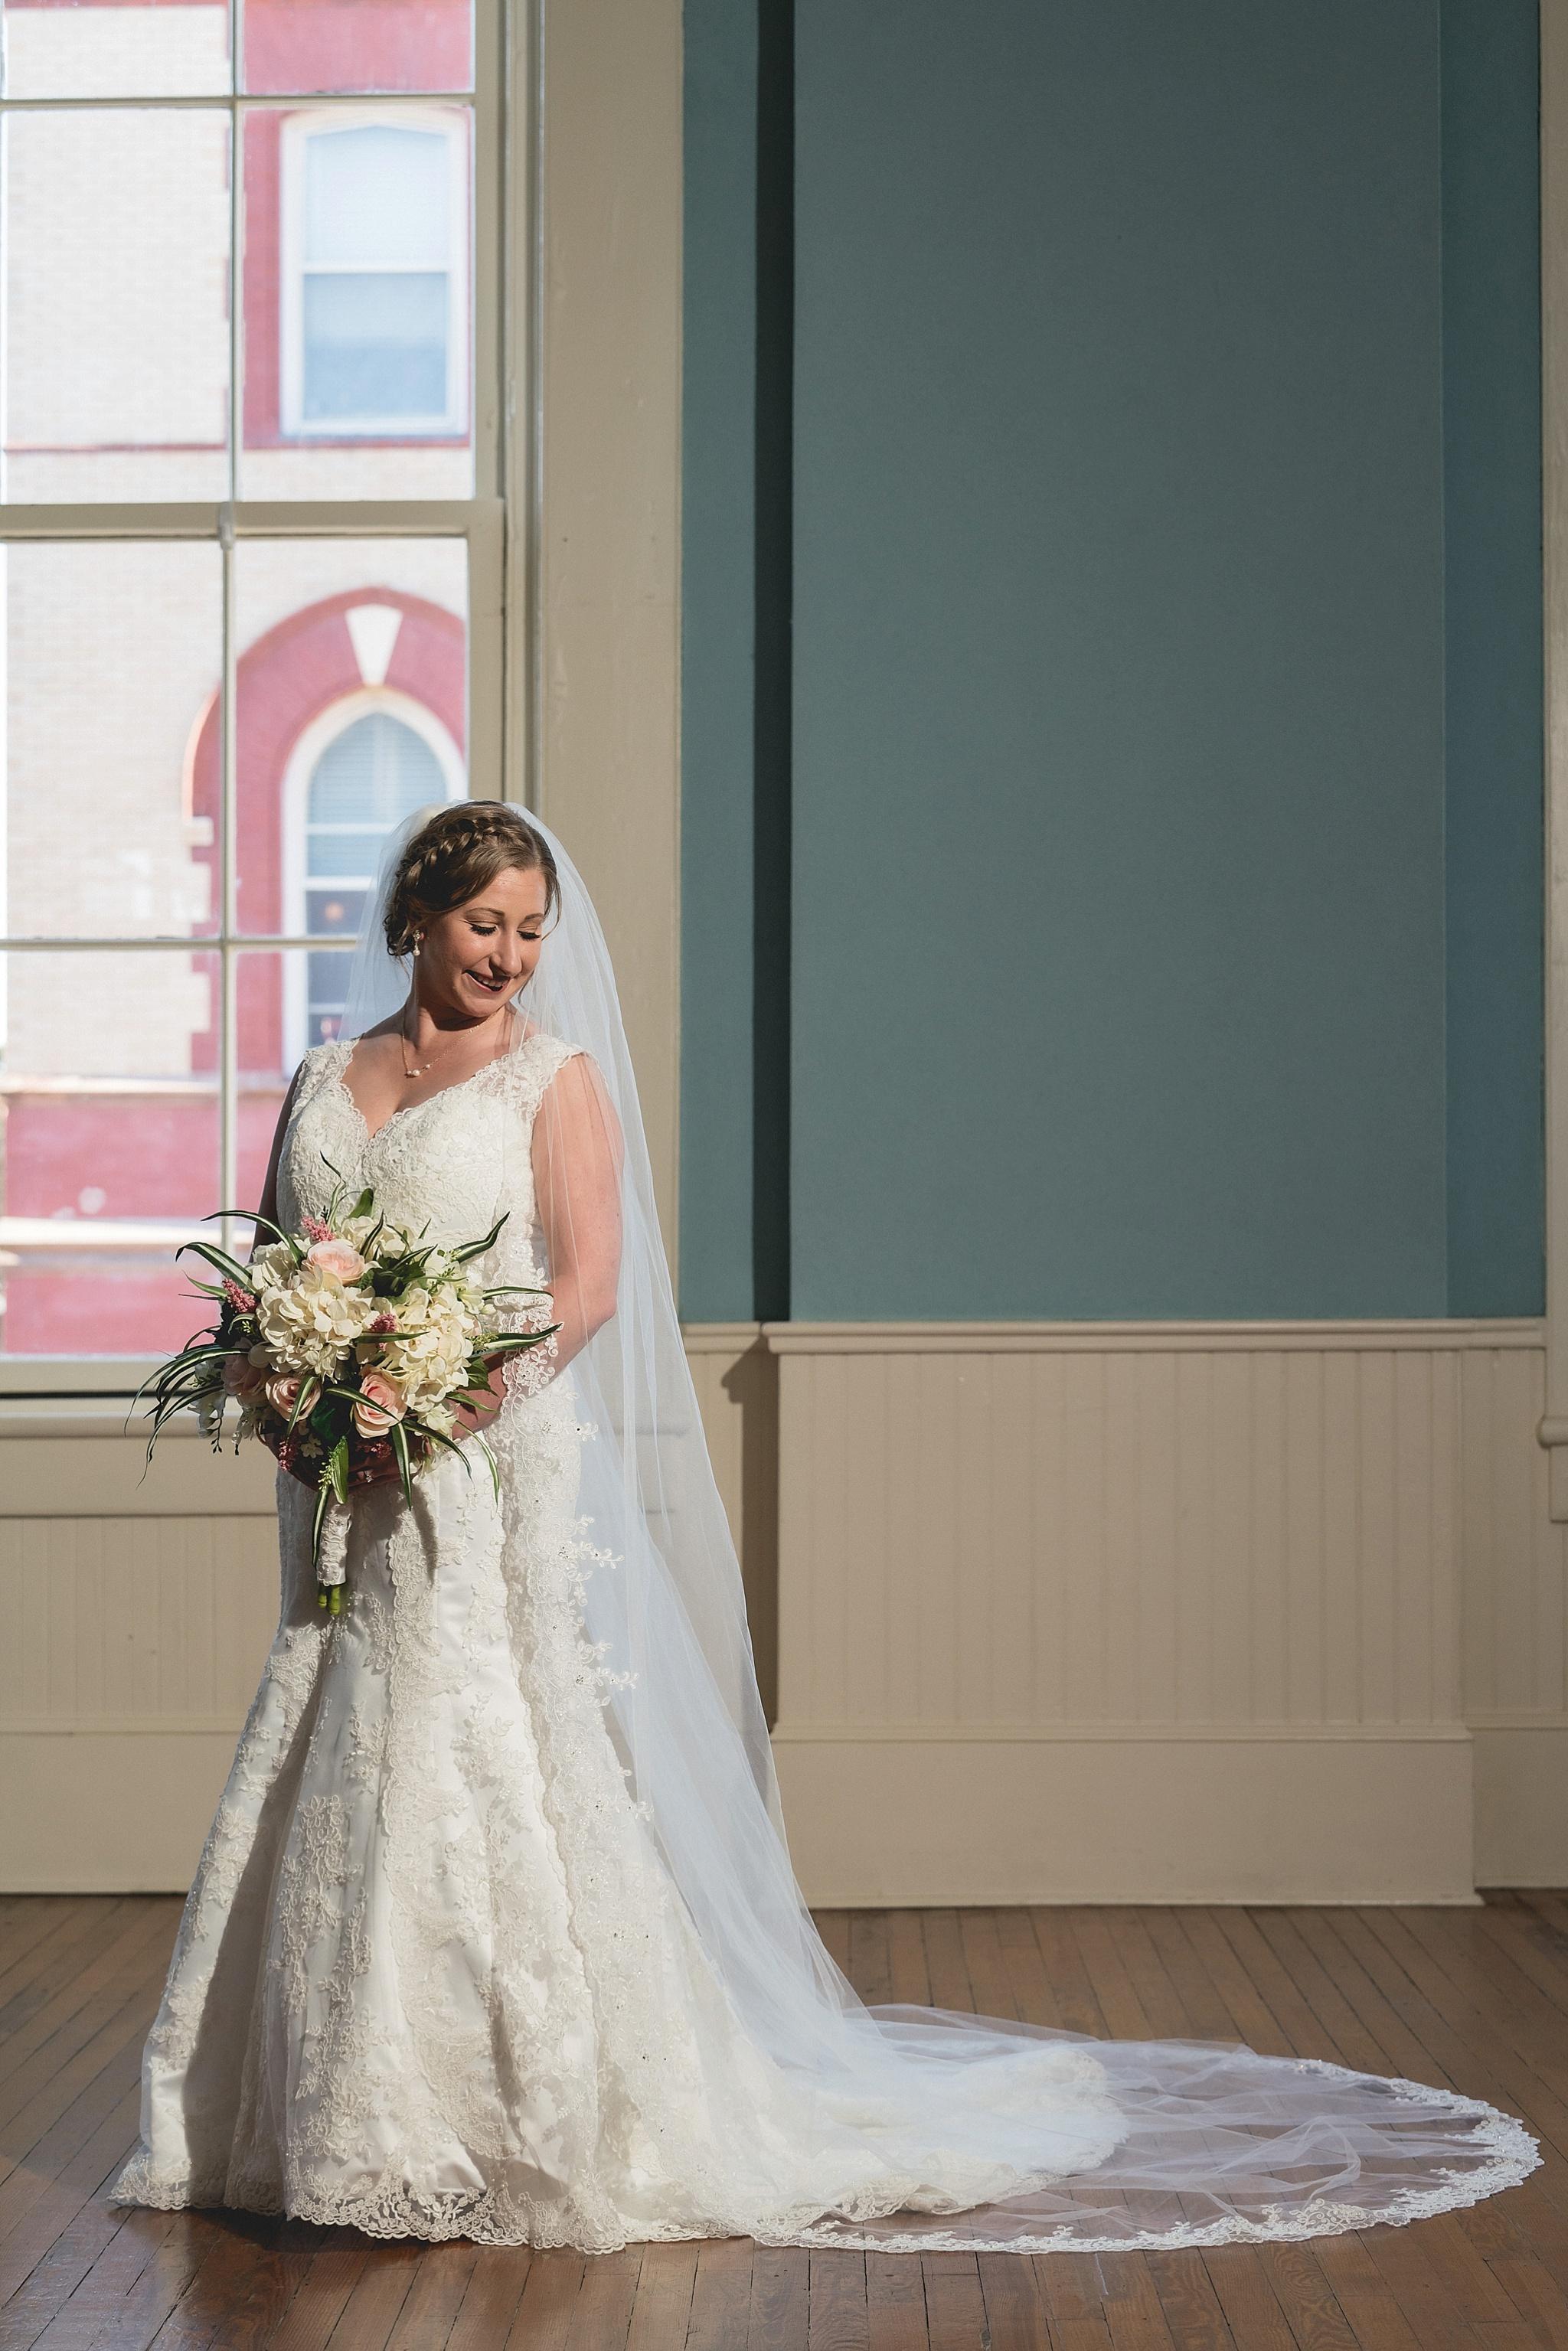 New-Bern-NC-Wedding-Photographer-050.jpg